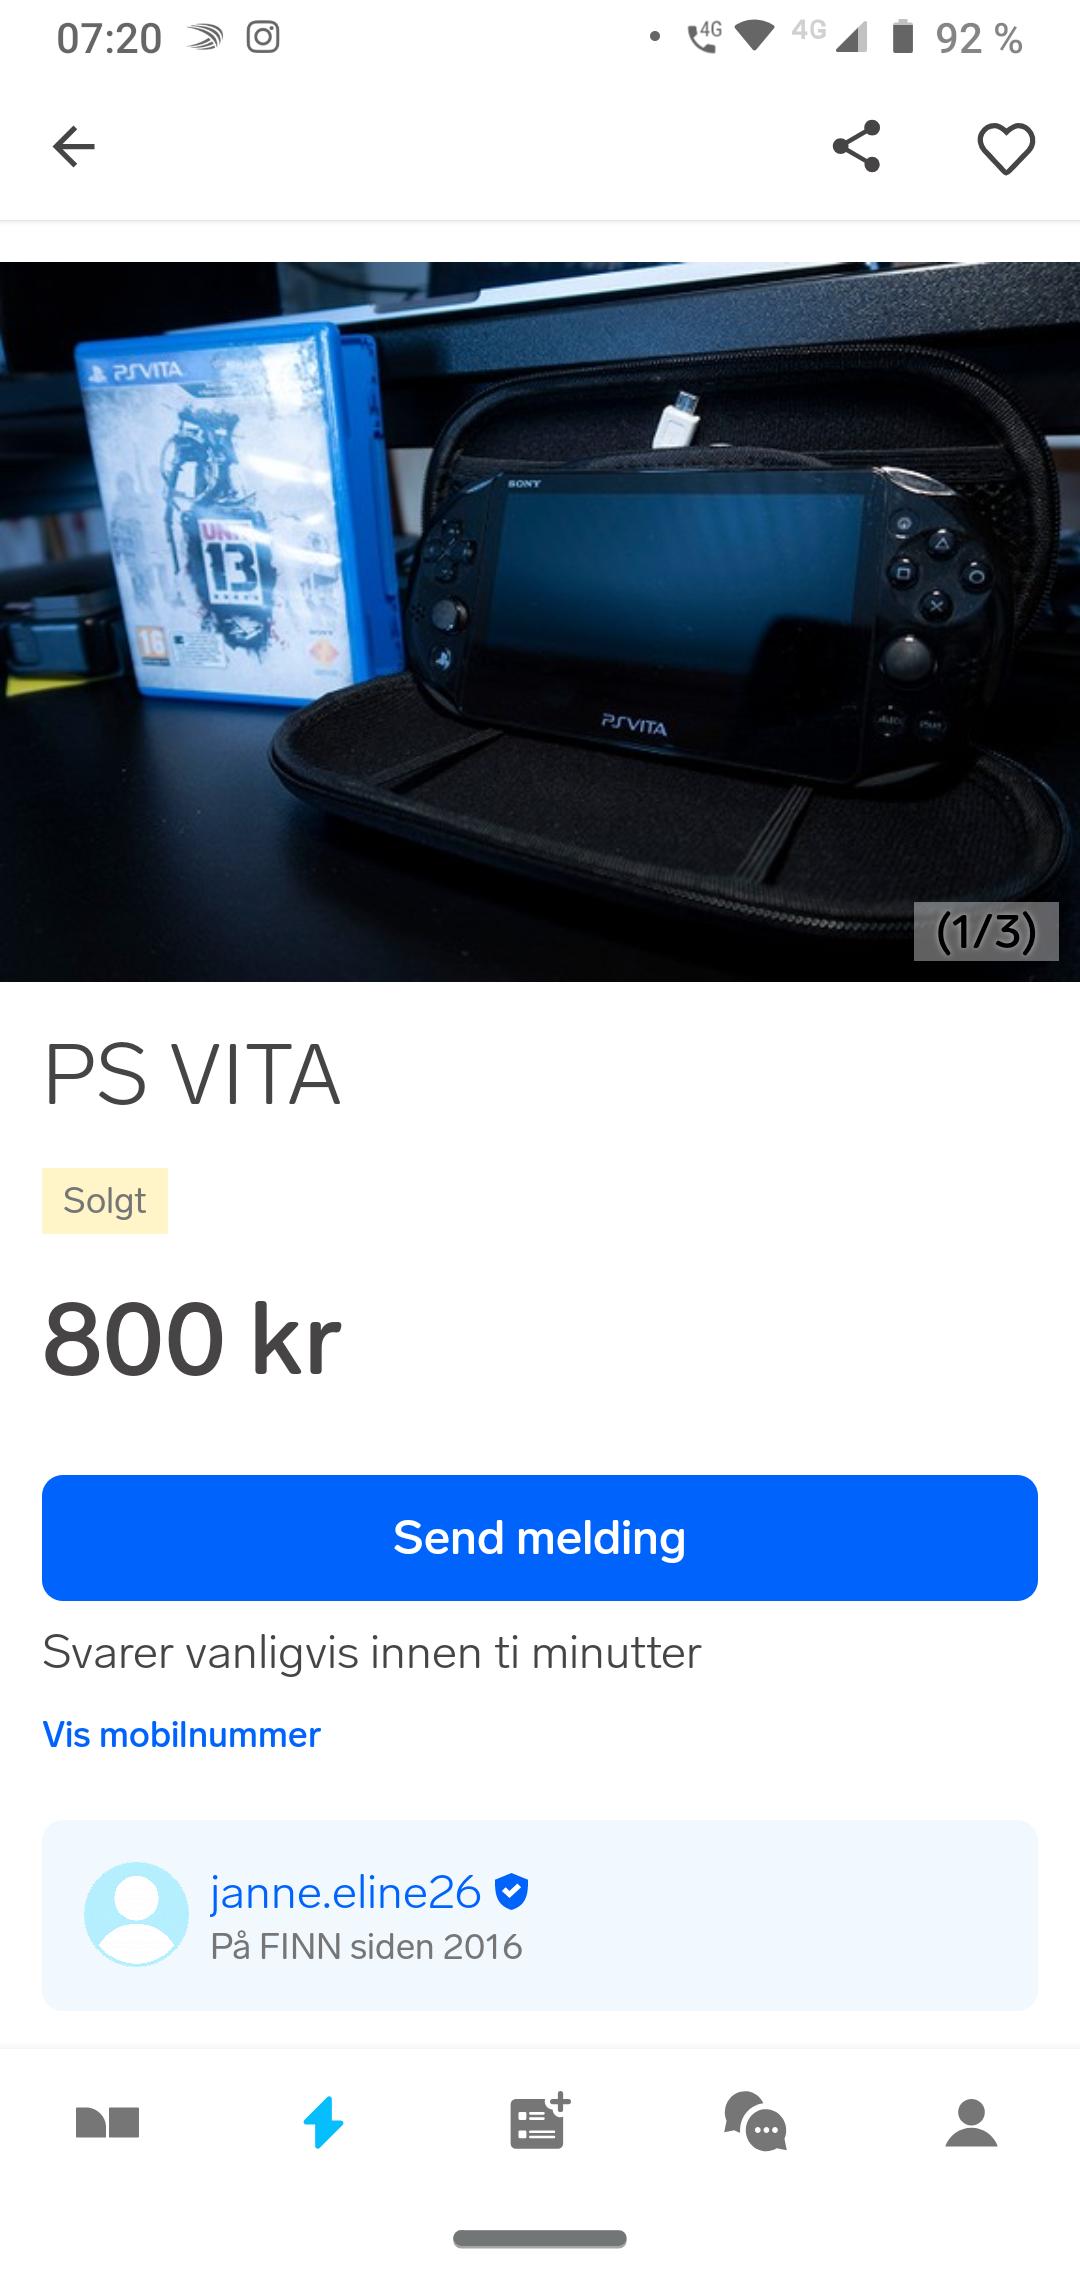 Screenshot_20200407-072051.png